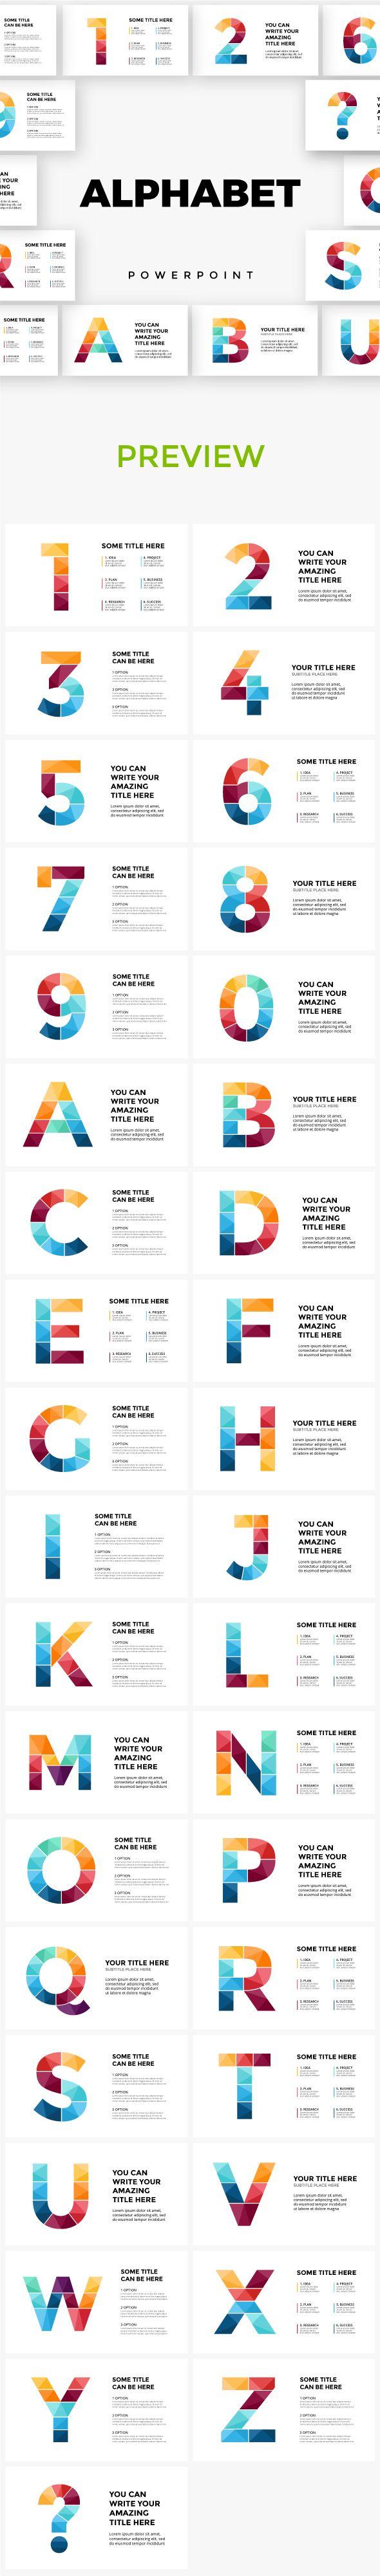 Alphabet Powerpoint Infographic Templates